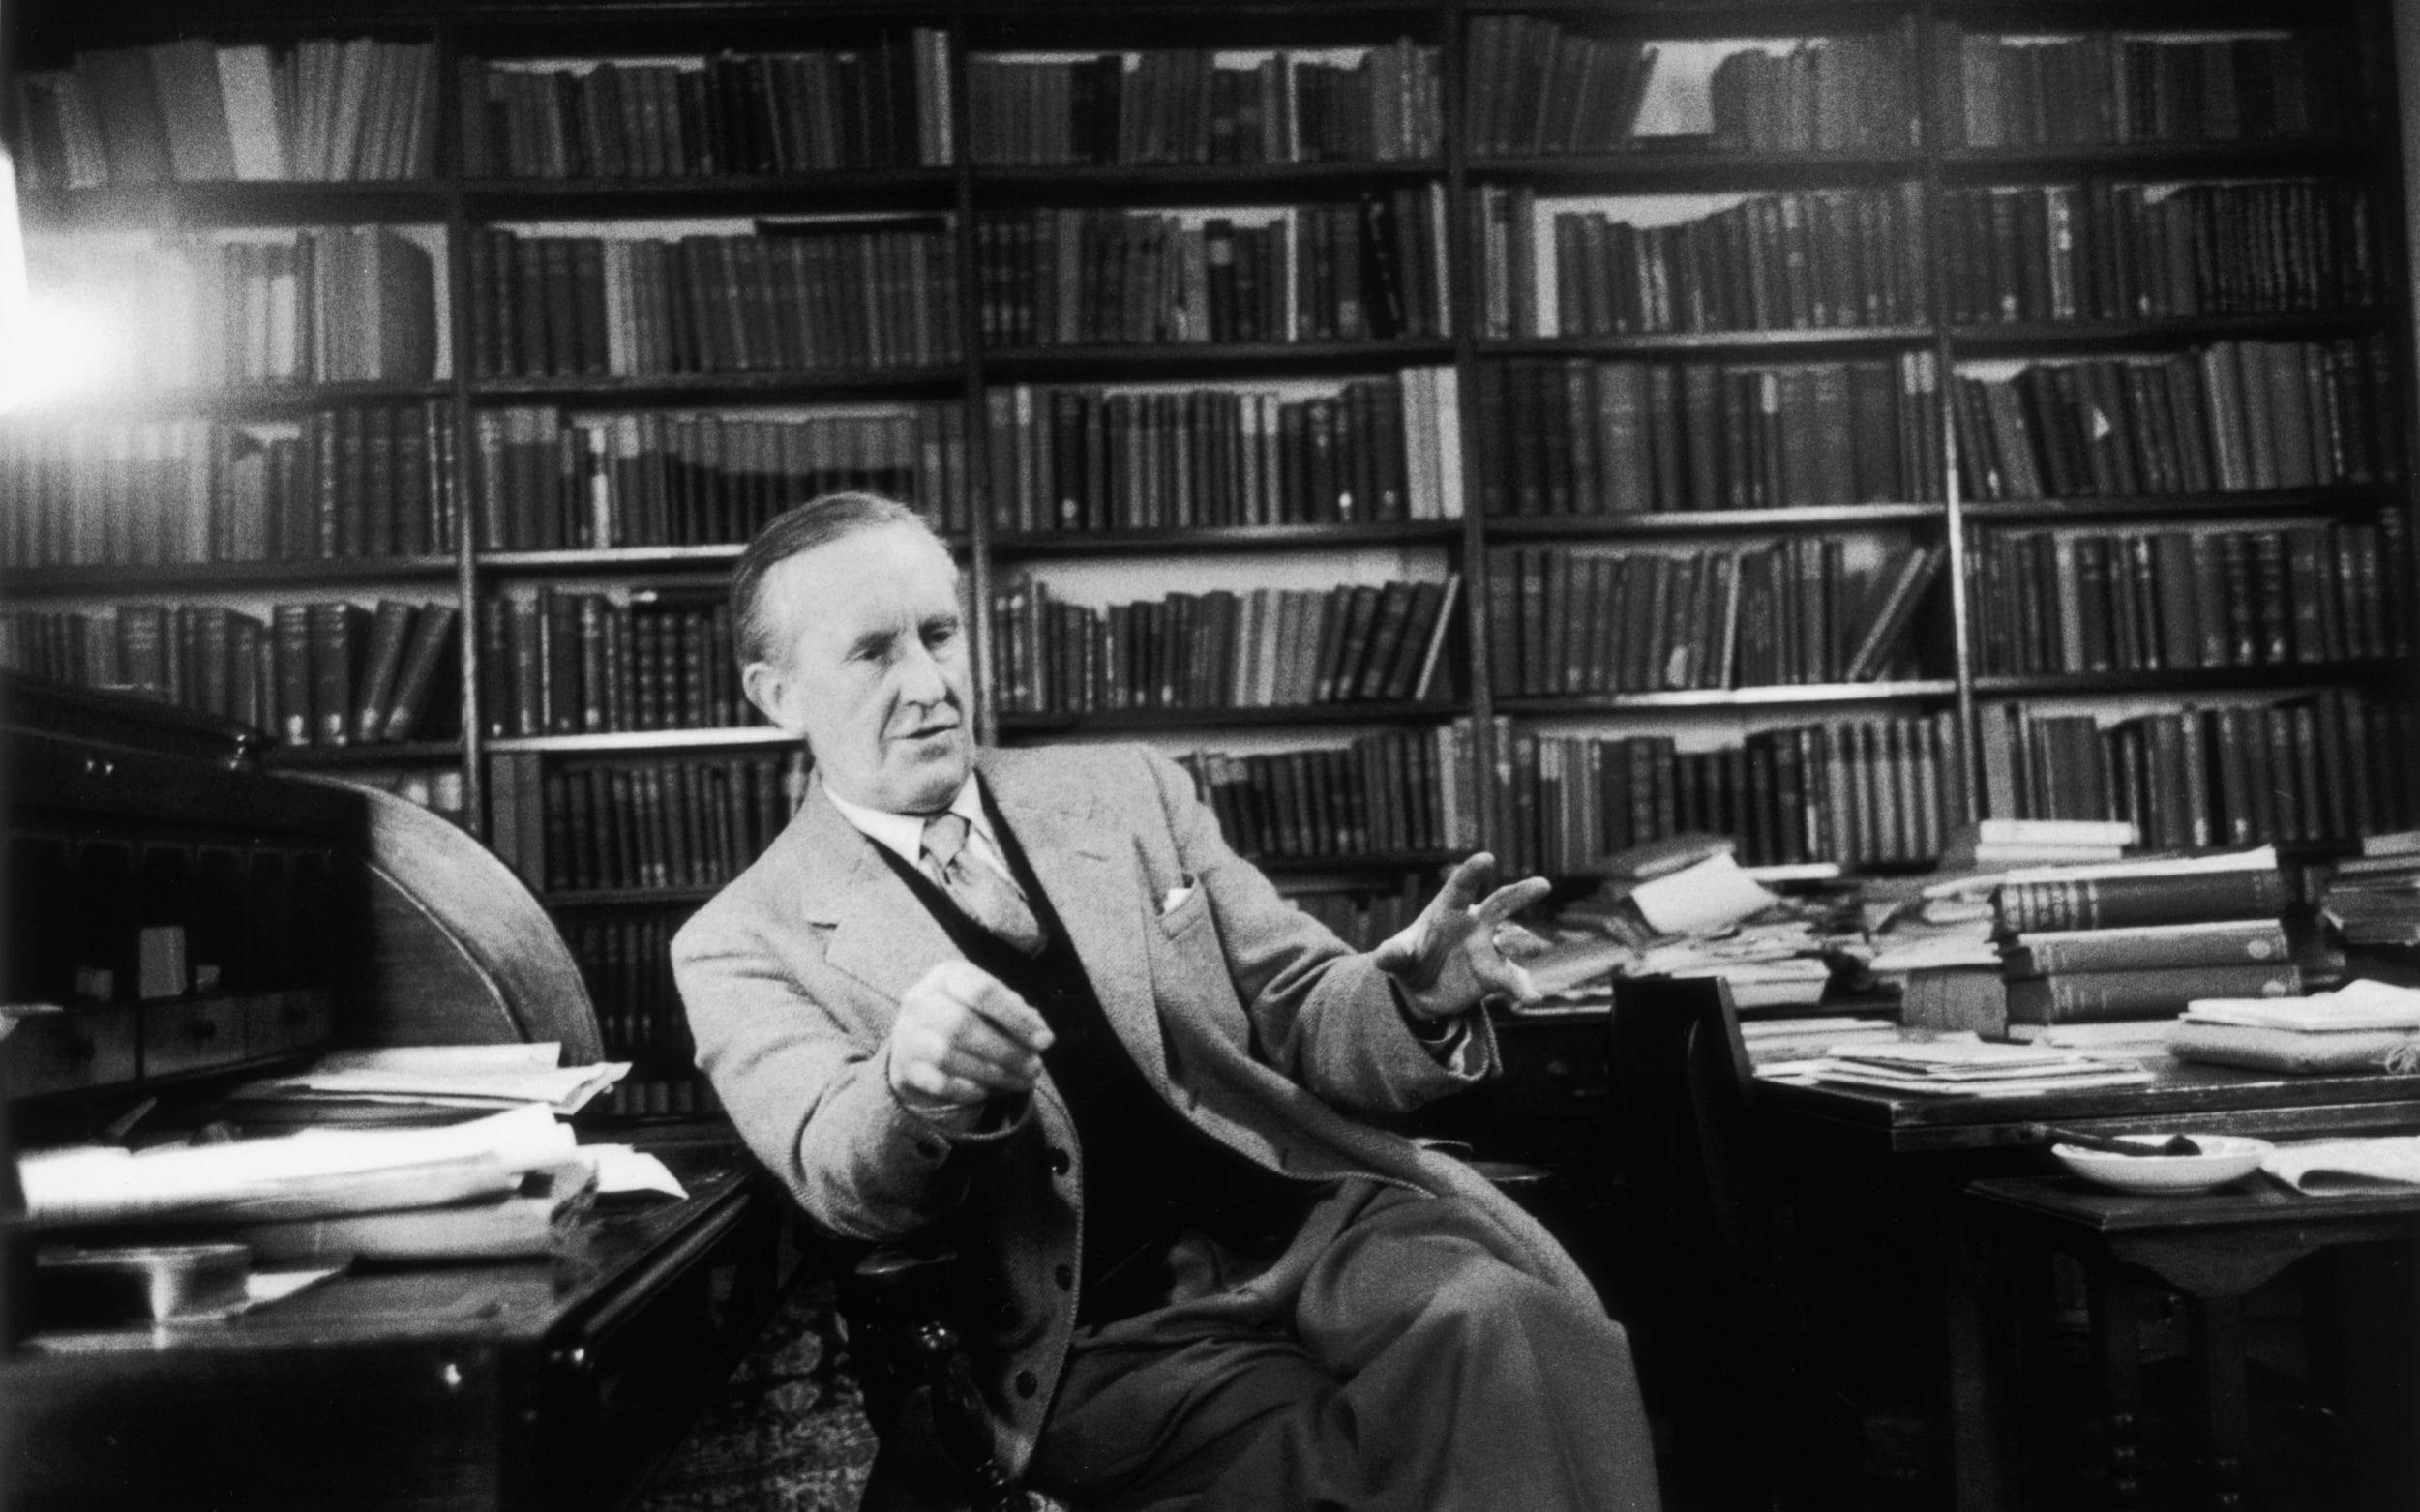 Autores-profesores-antes-escritores-circulo-rojo